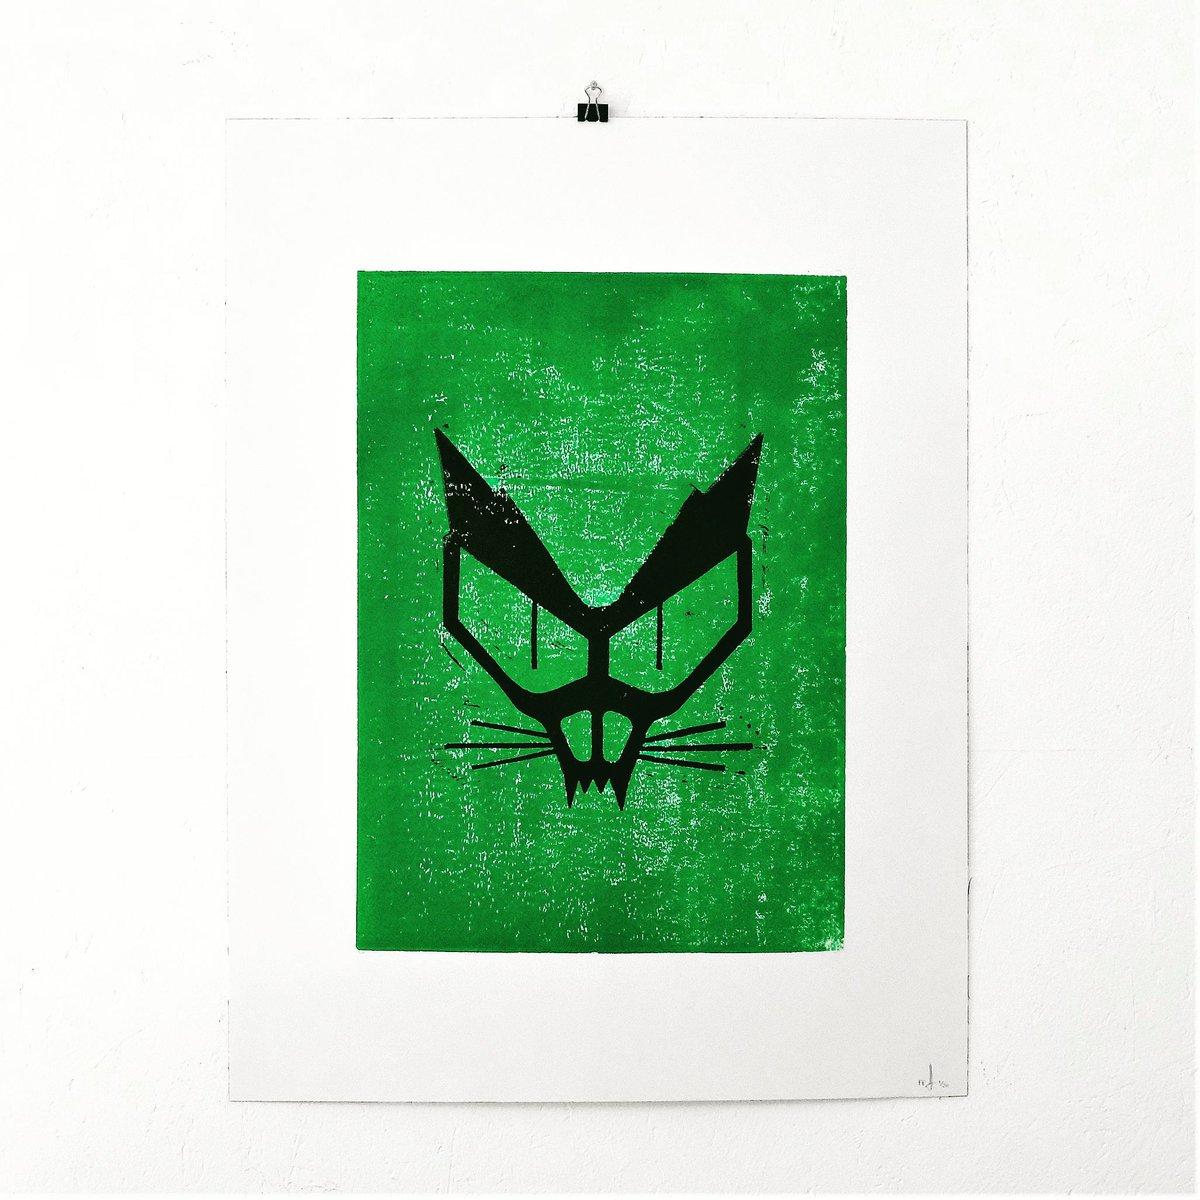 CHAT NOIR - #linogravure 46x61cm -  #ecologie #libertaire #green #blackcat #lino #linocut #print #ecology #extinctionrebellion #cat #poster #affiche #anarchy #anarchie<br>http://pic.twitter.com/G2PwqCkwQW